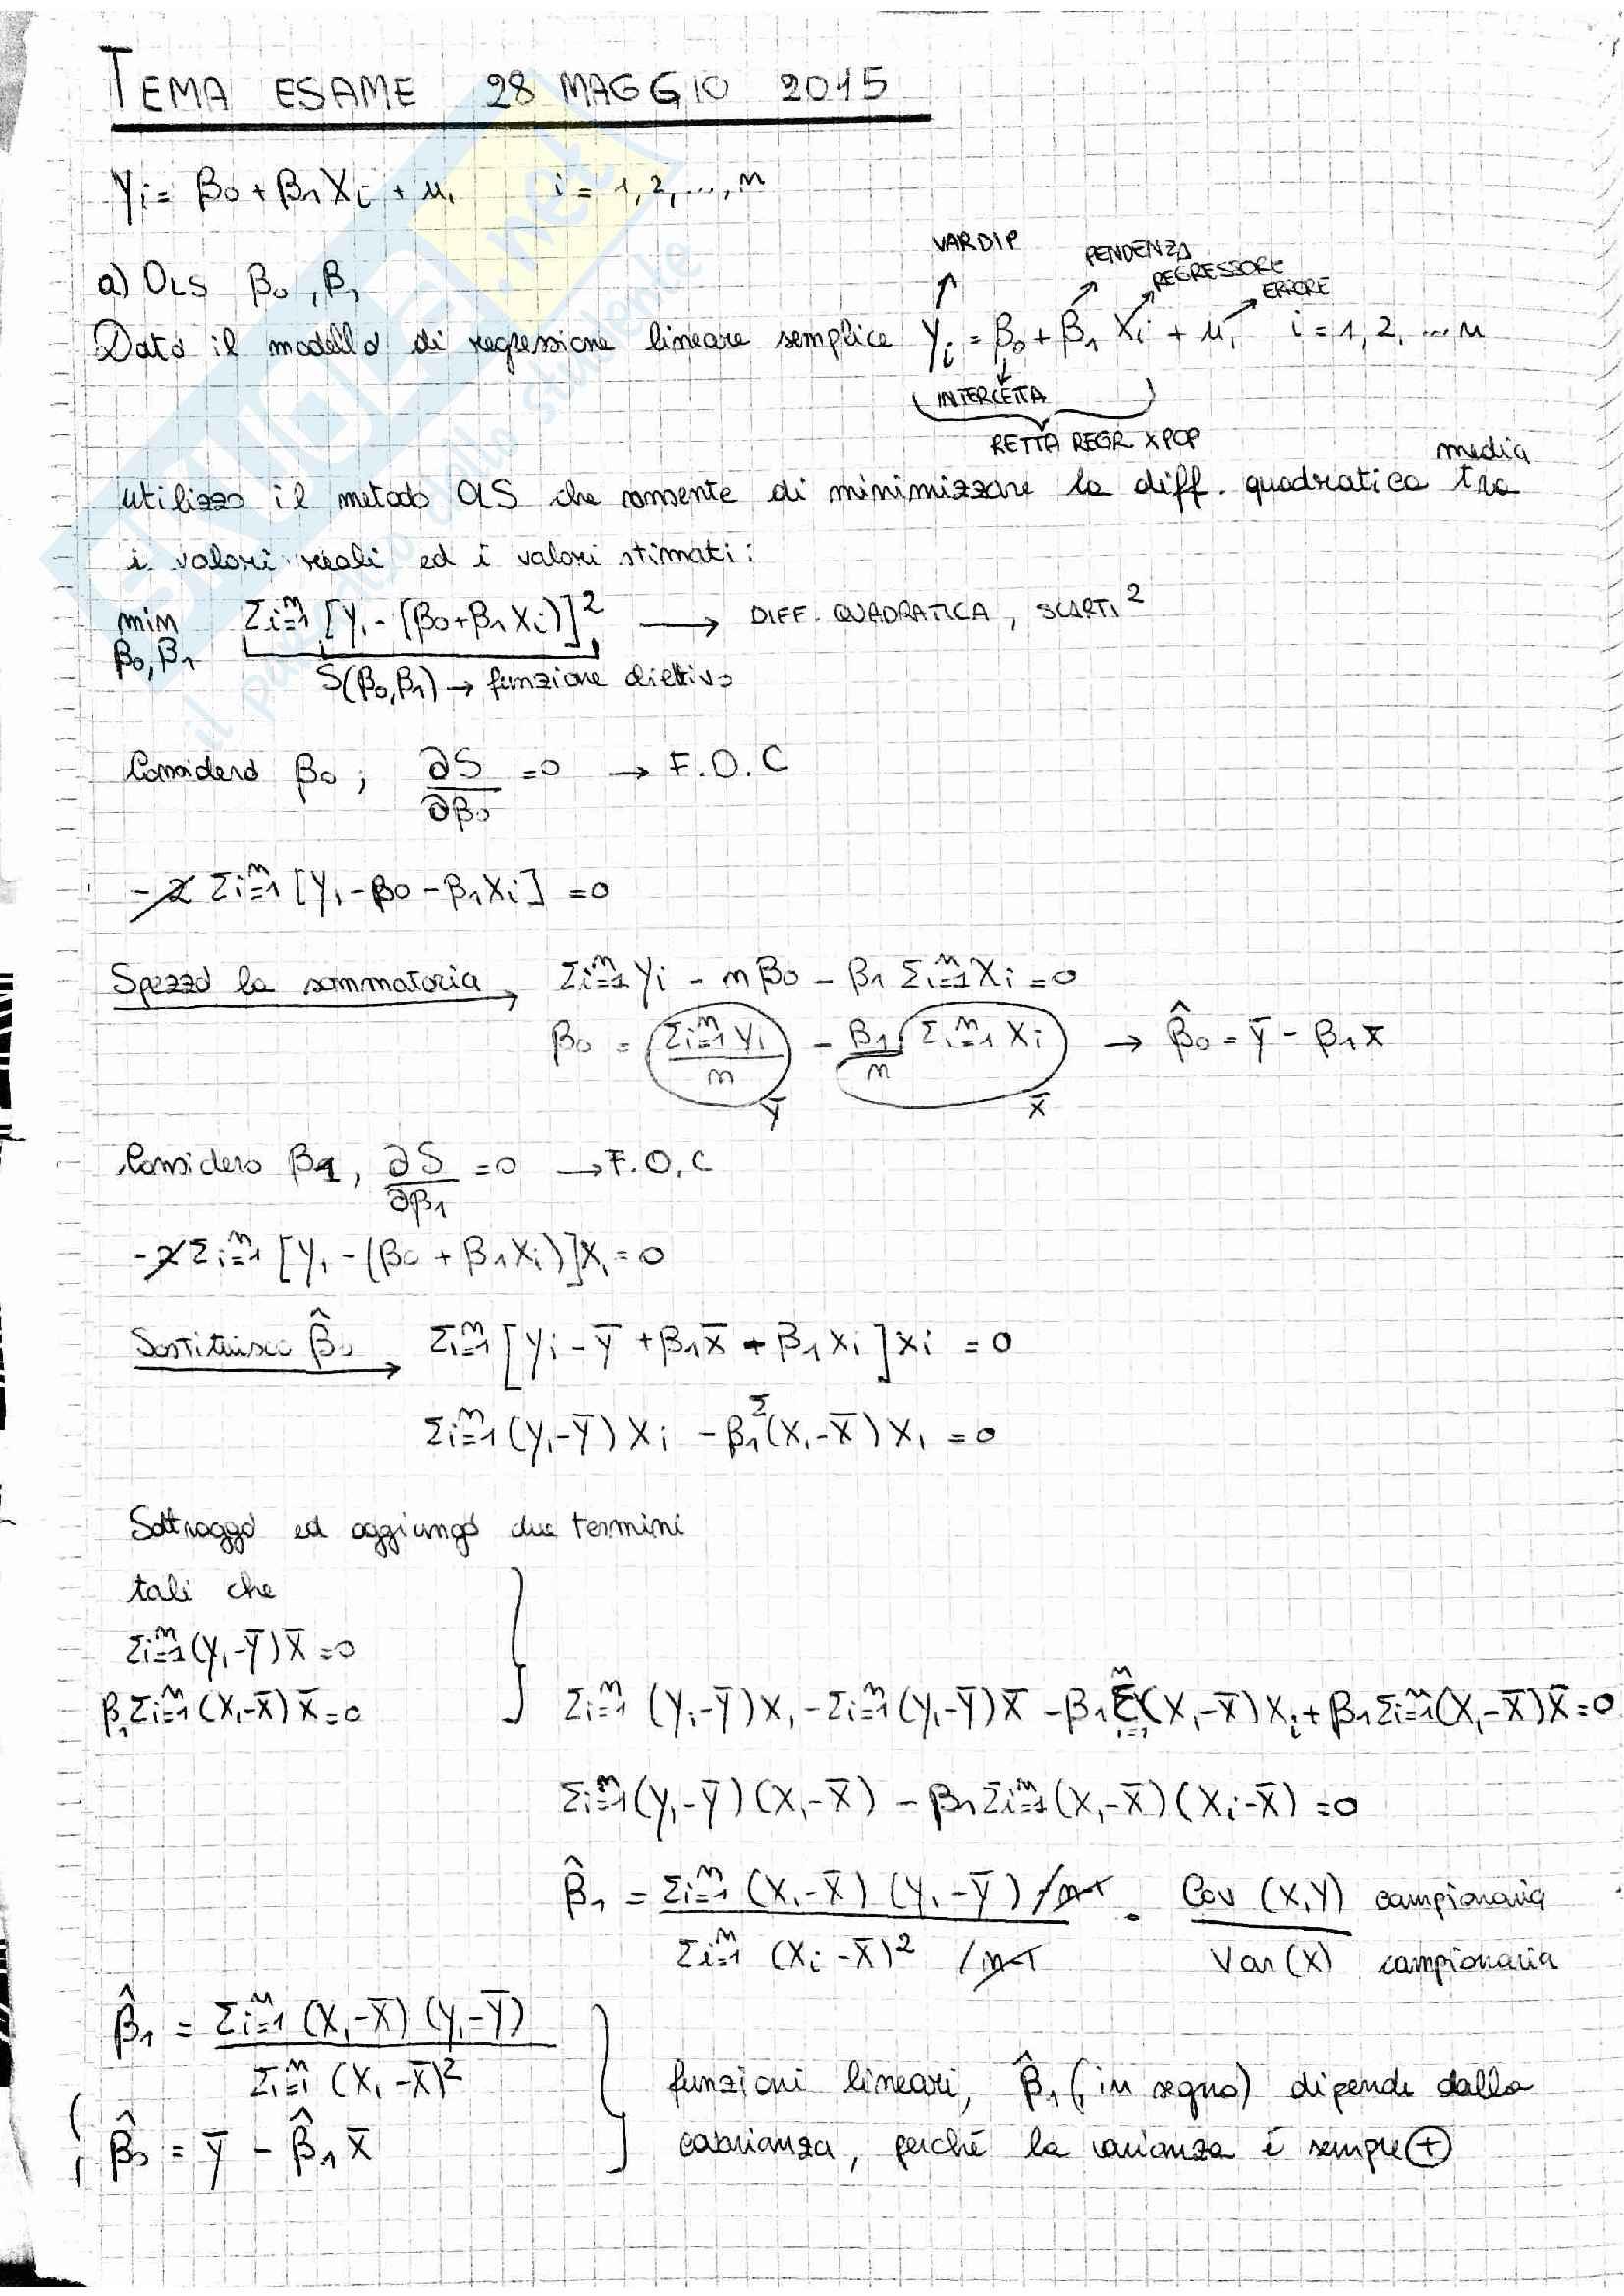 Temi esame Econometria